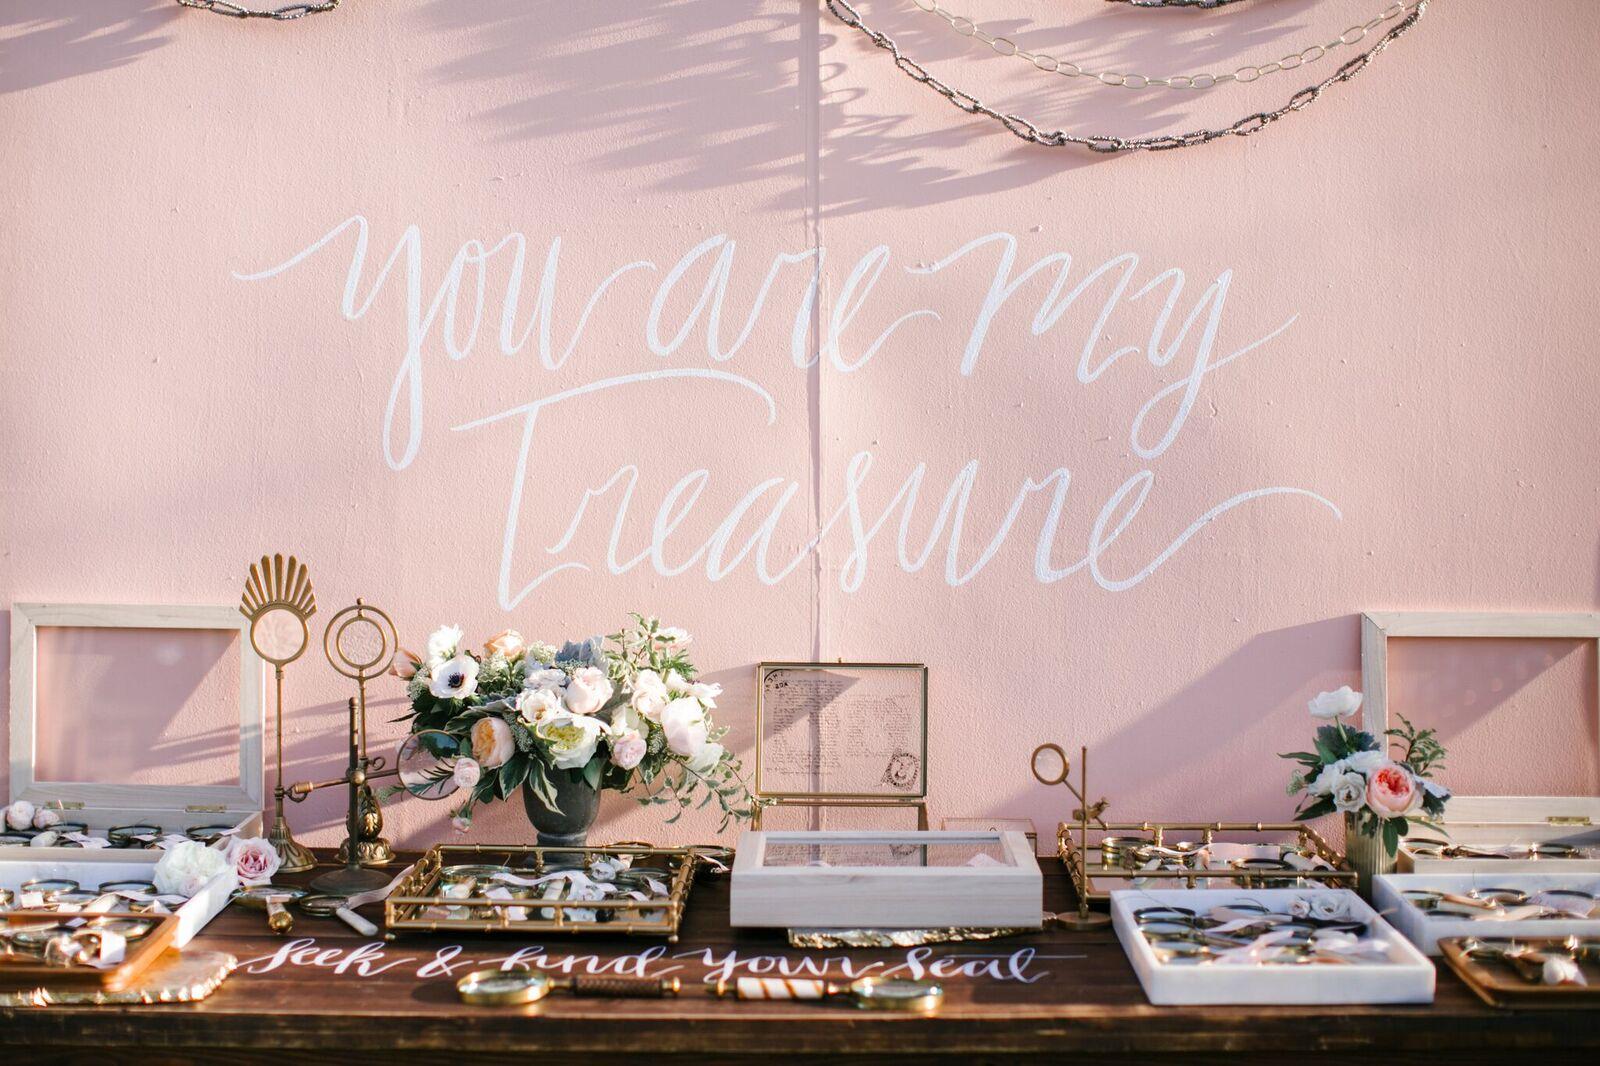 You Are My Treasure - Amorology